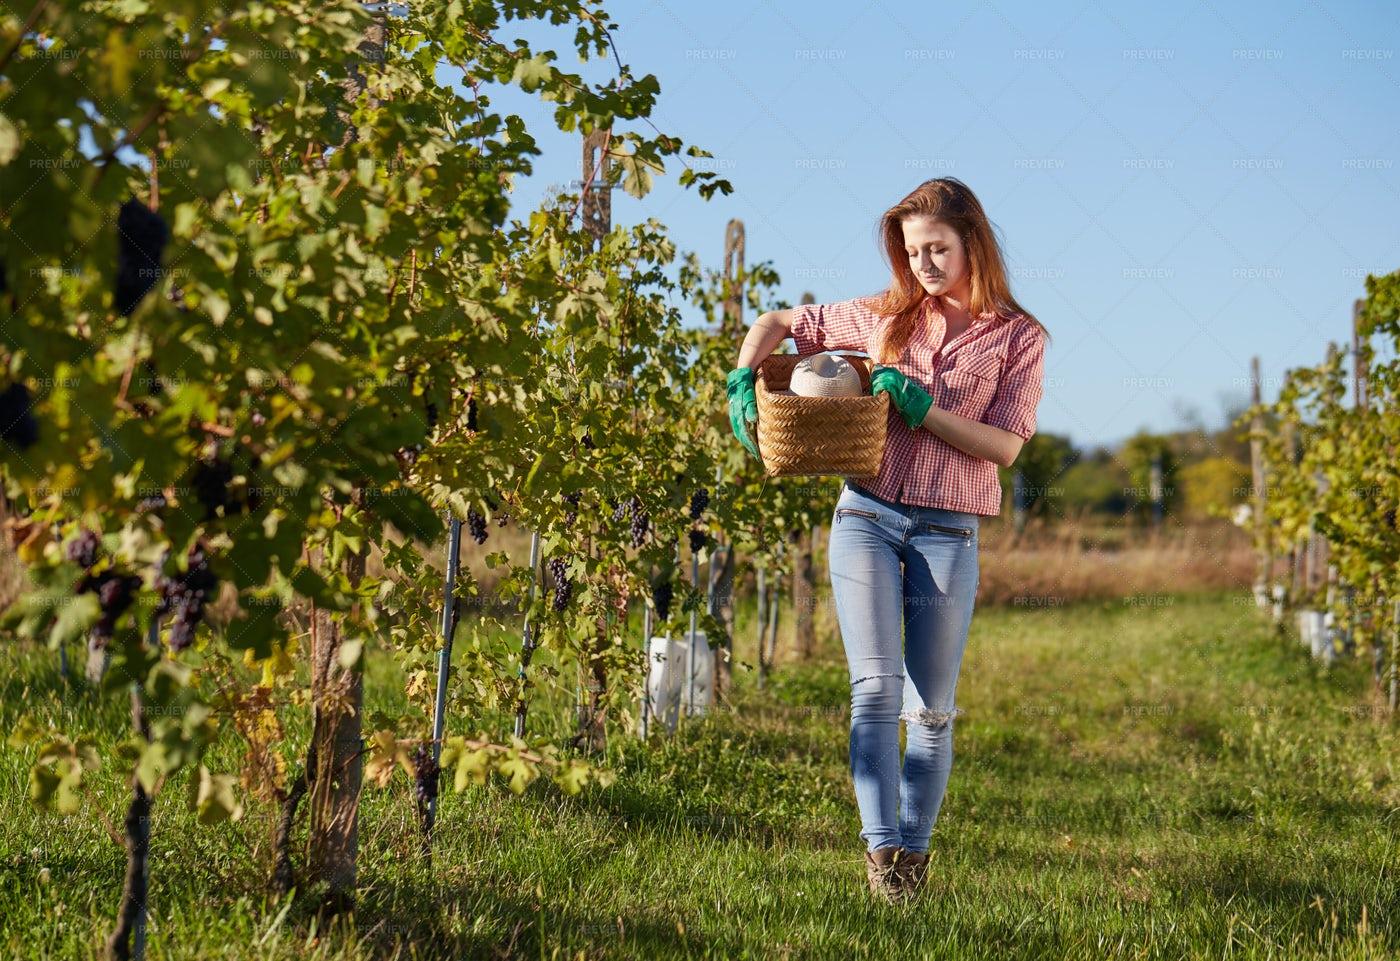 Grape Harvester With Basket: Stock Photos